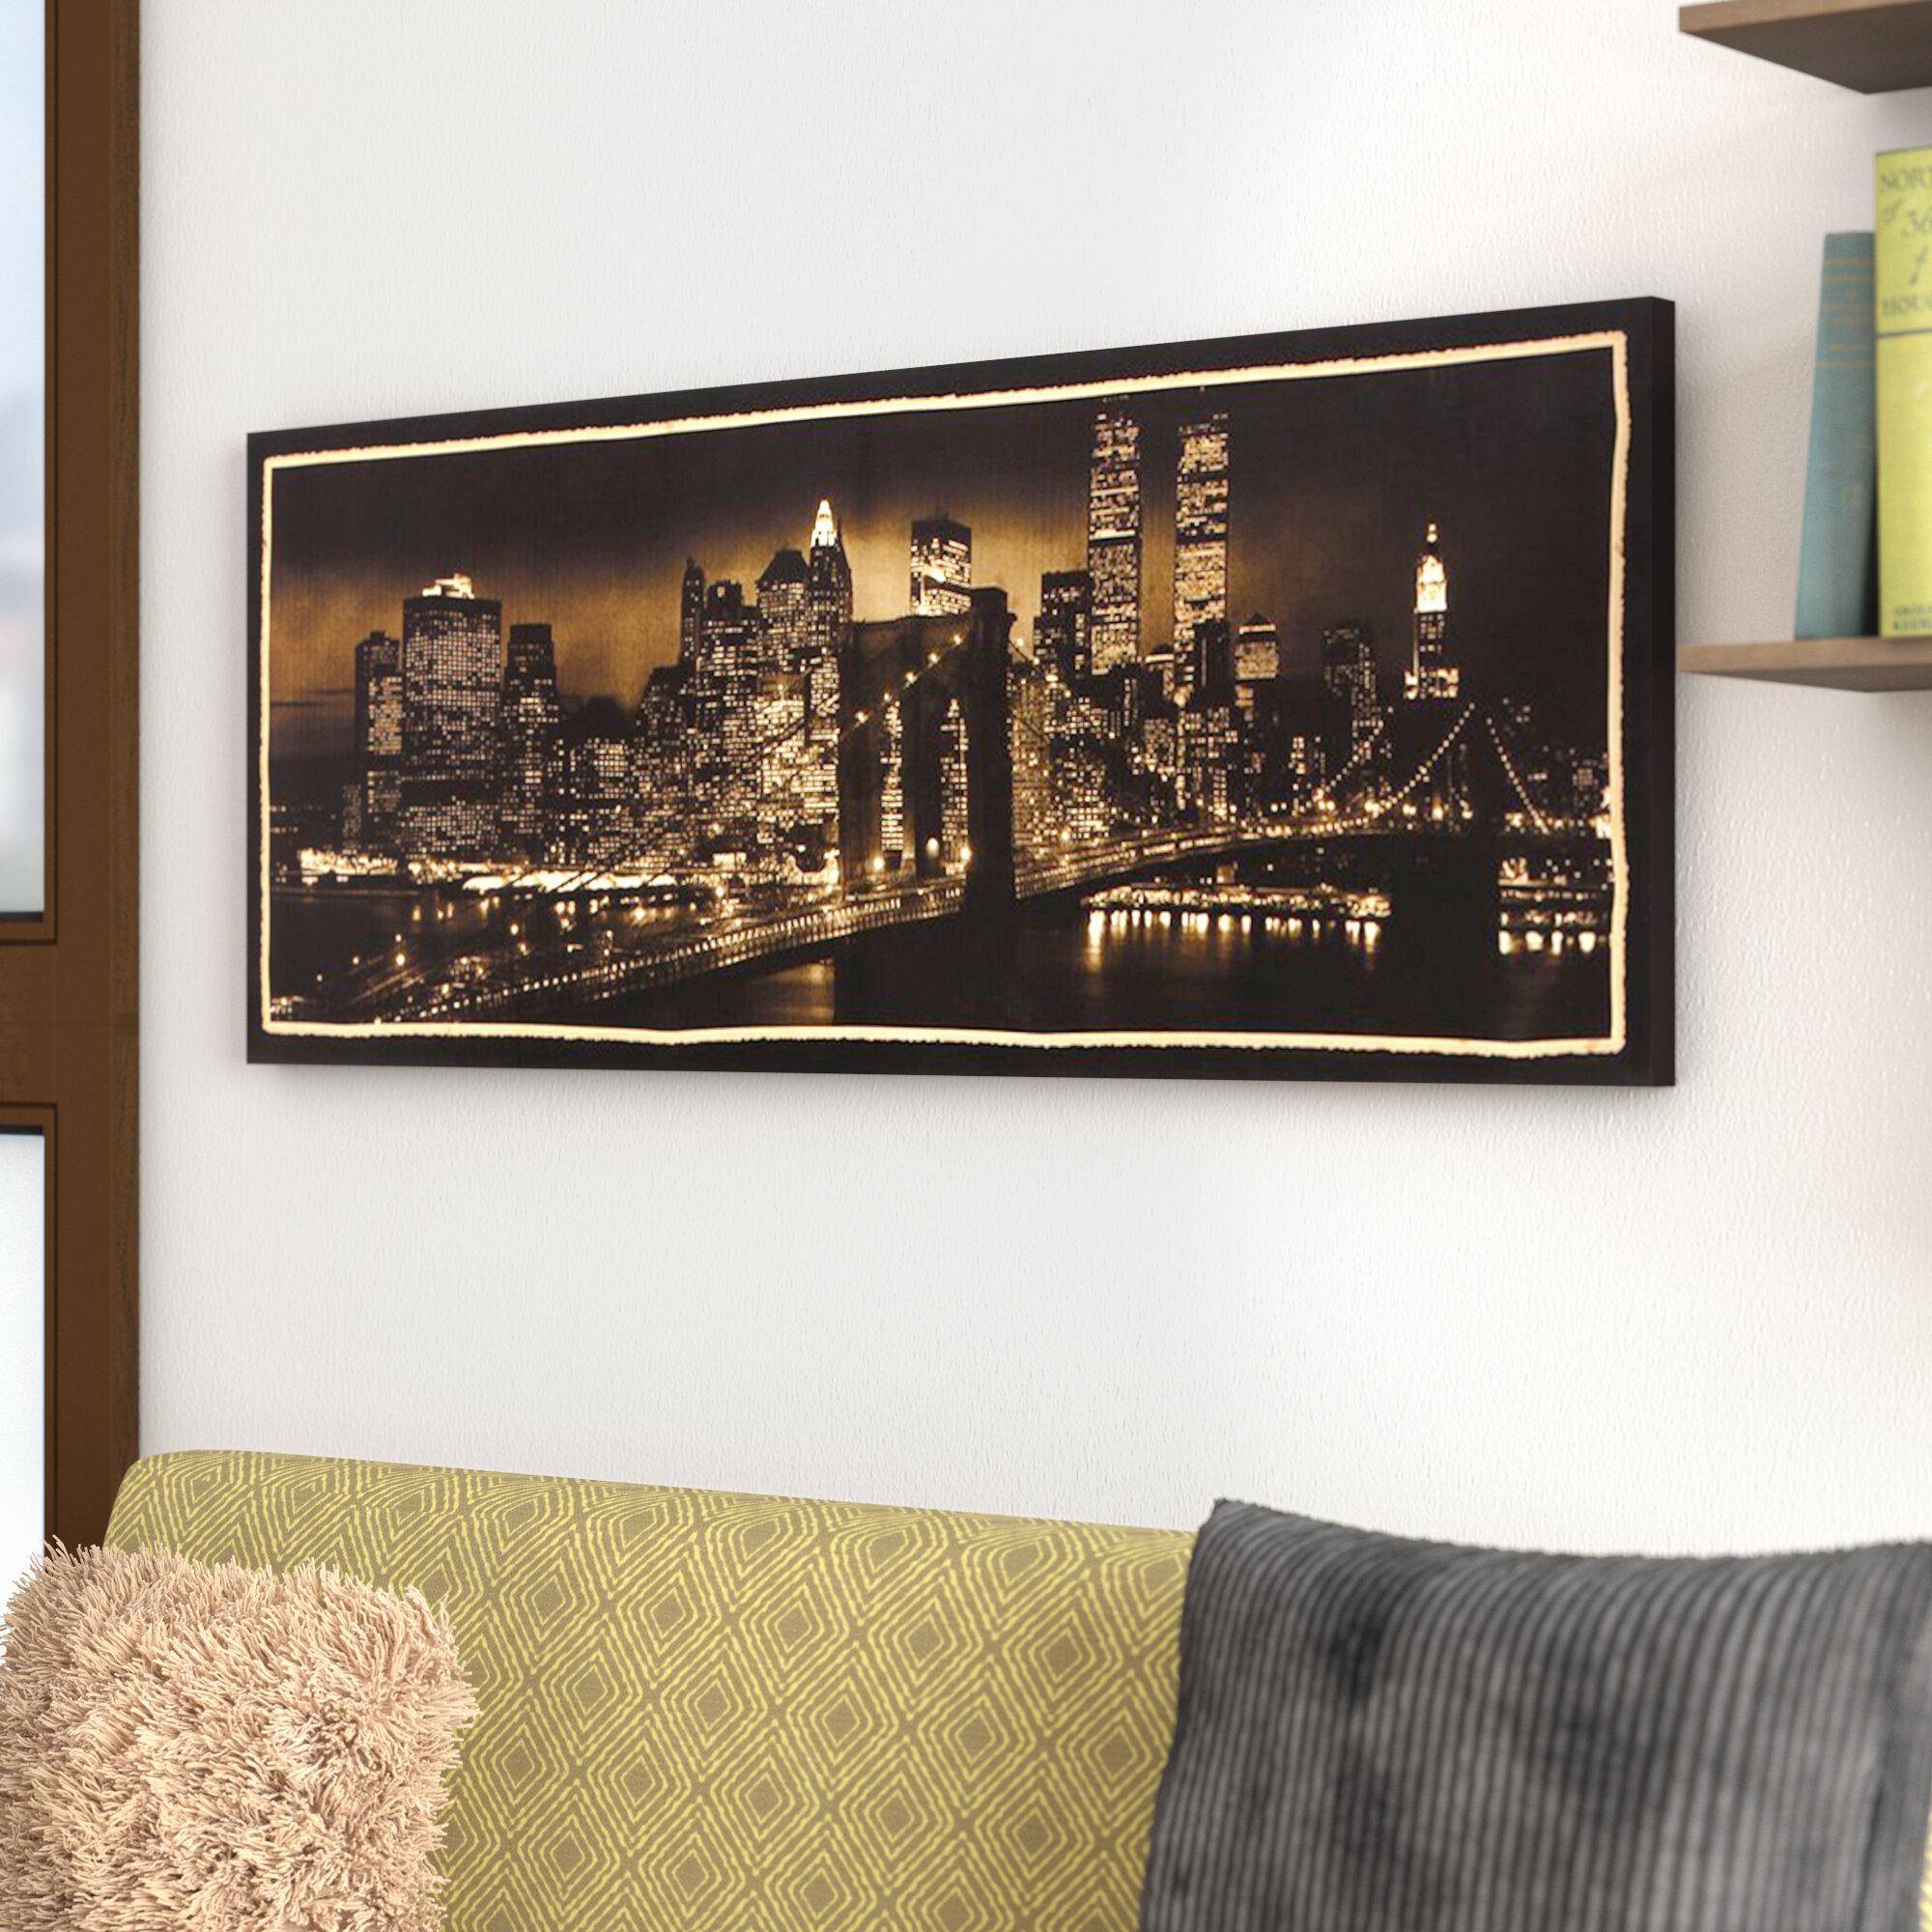 Ebern Designs New York Skyline Framed Photographic Print On Wrapped Canvas Reviews Wayfair